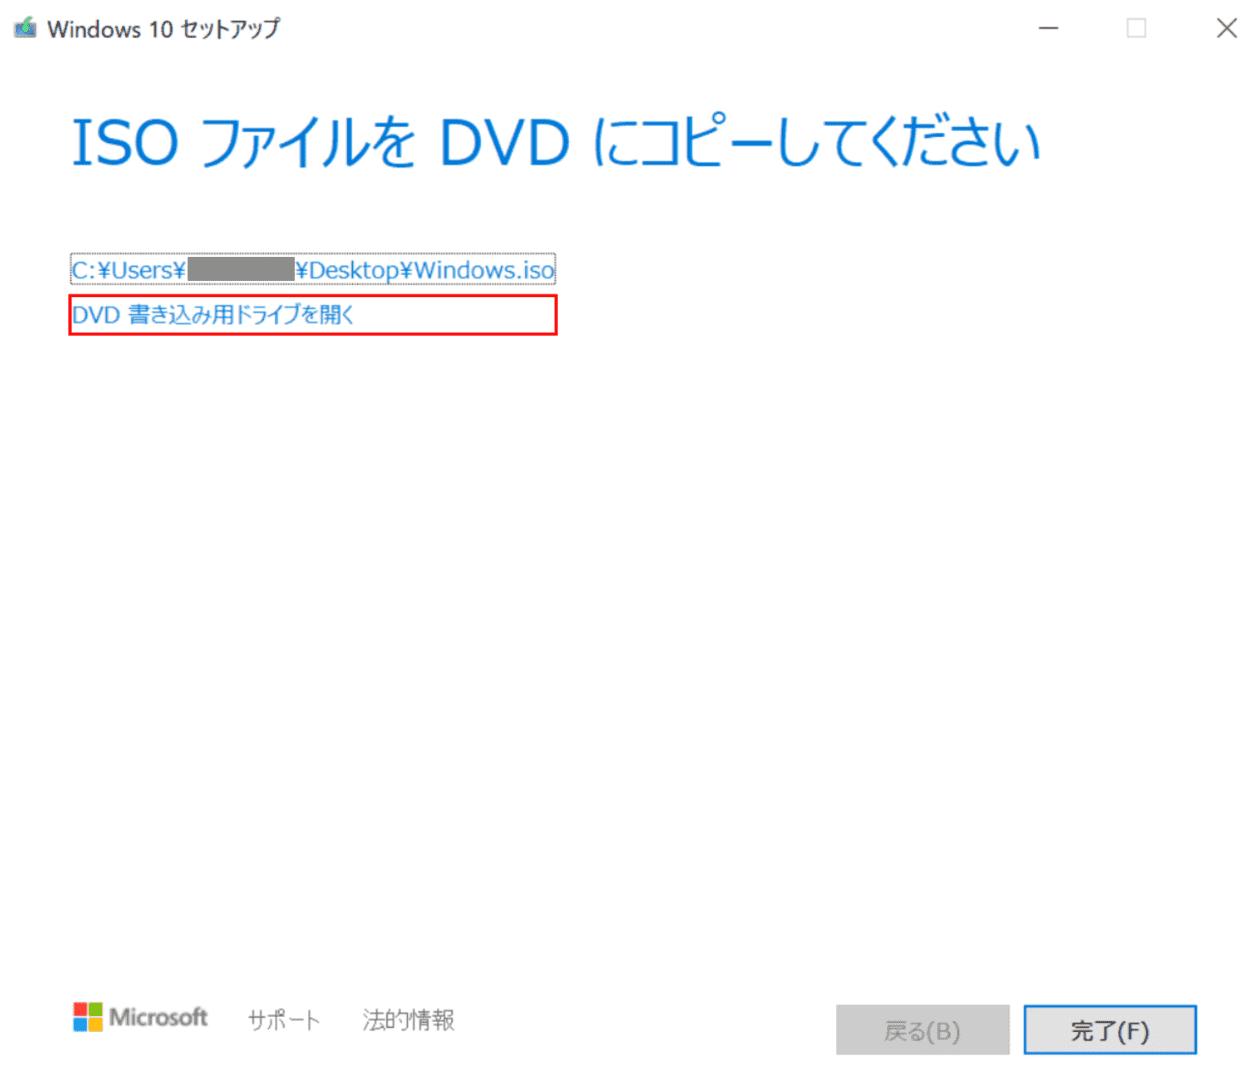 ISOファイルをDVDにコピー